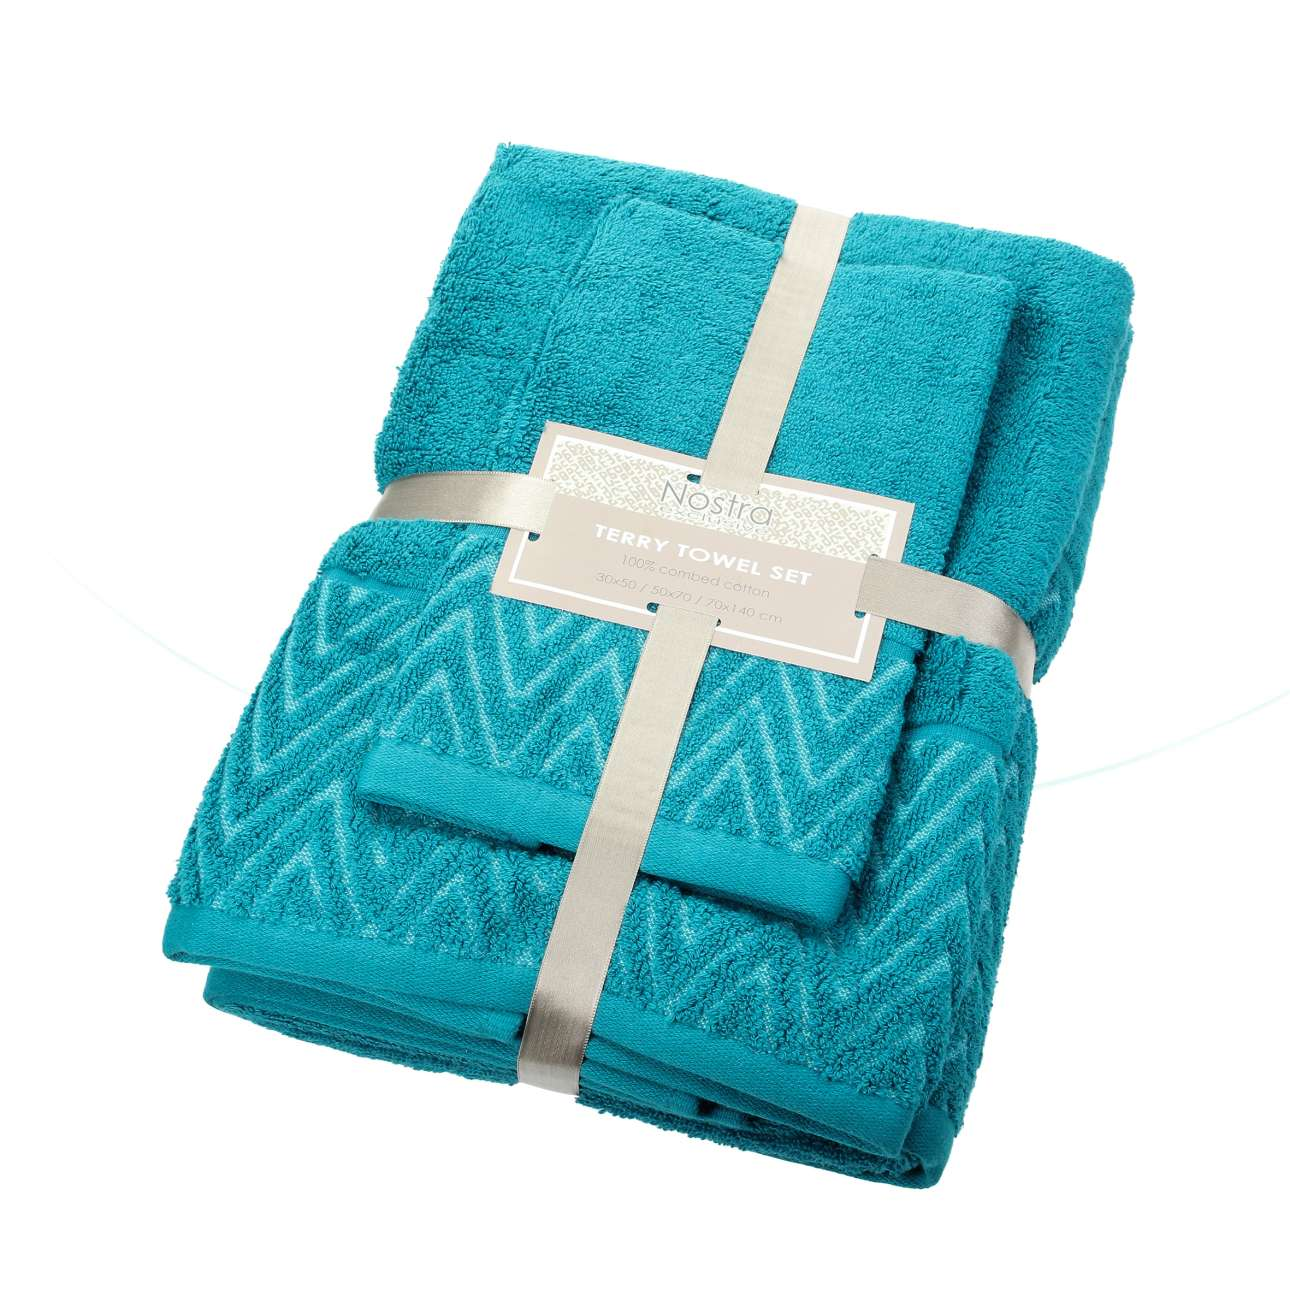 Sada 3 ks ručníků Terry caribbean blue